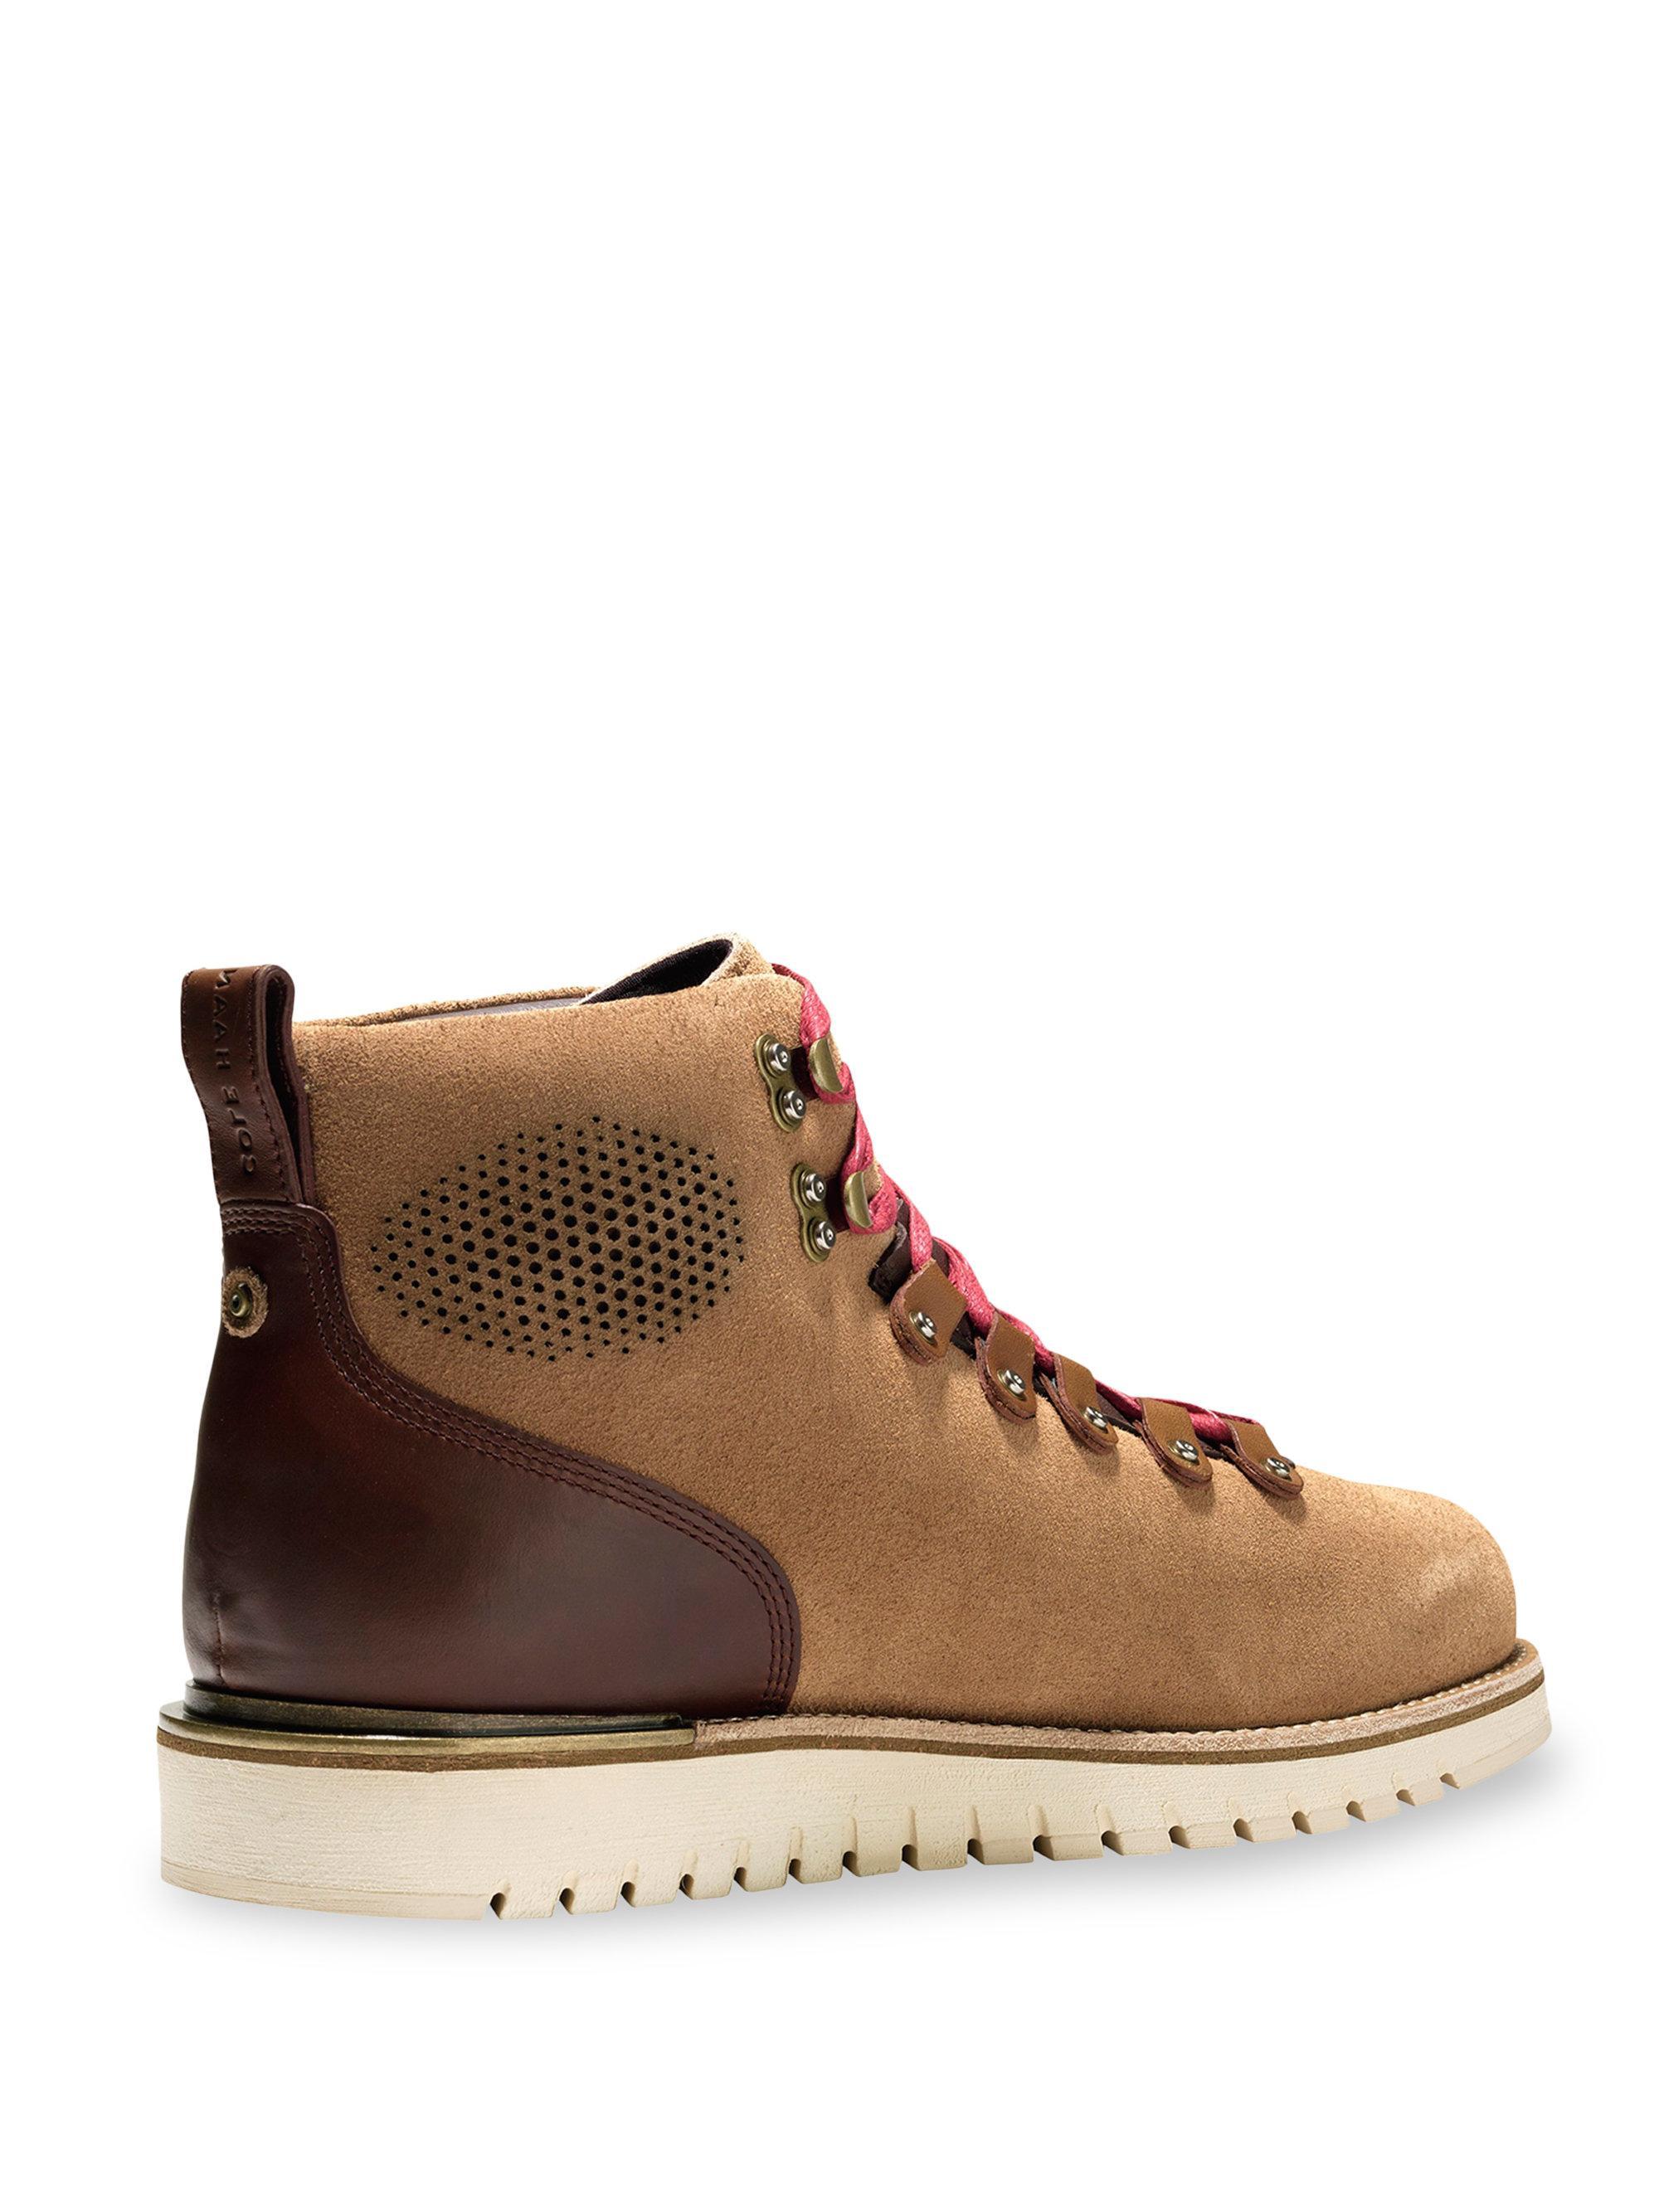 Cole Haan Levett Leather Hiker Boots JGYoJkiXH